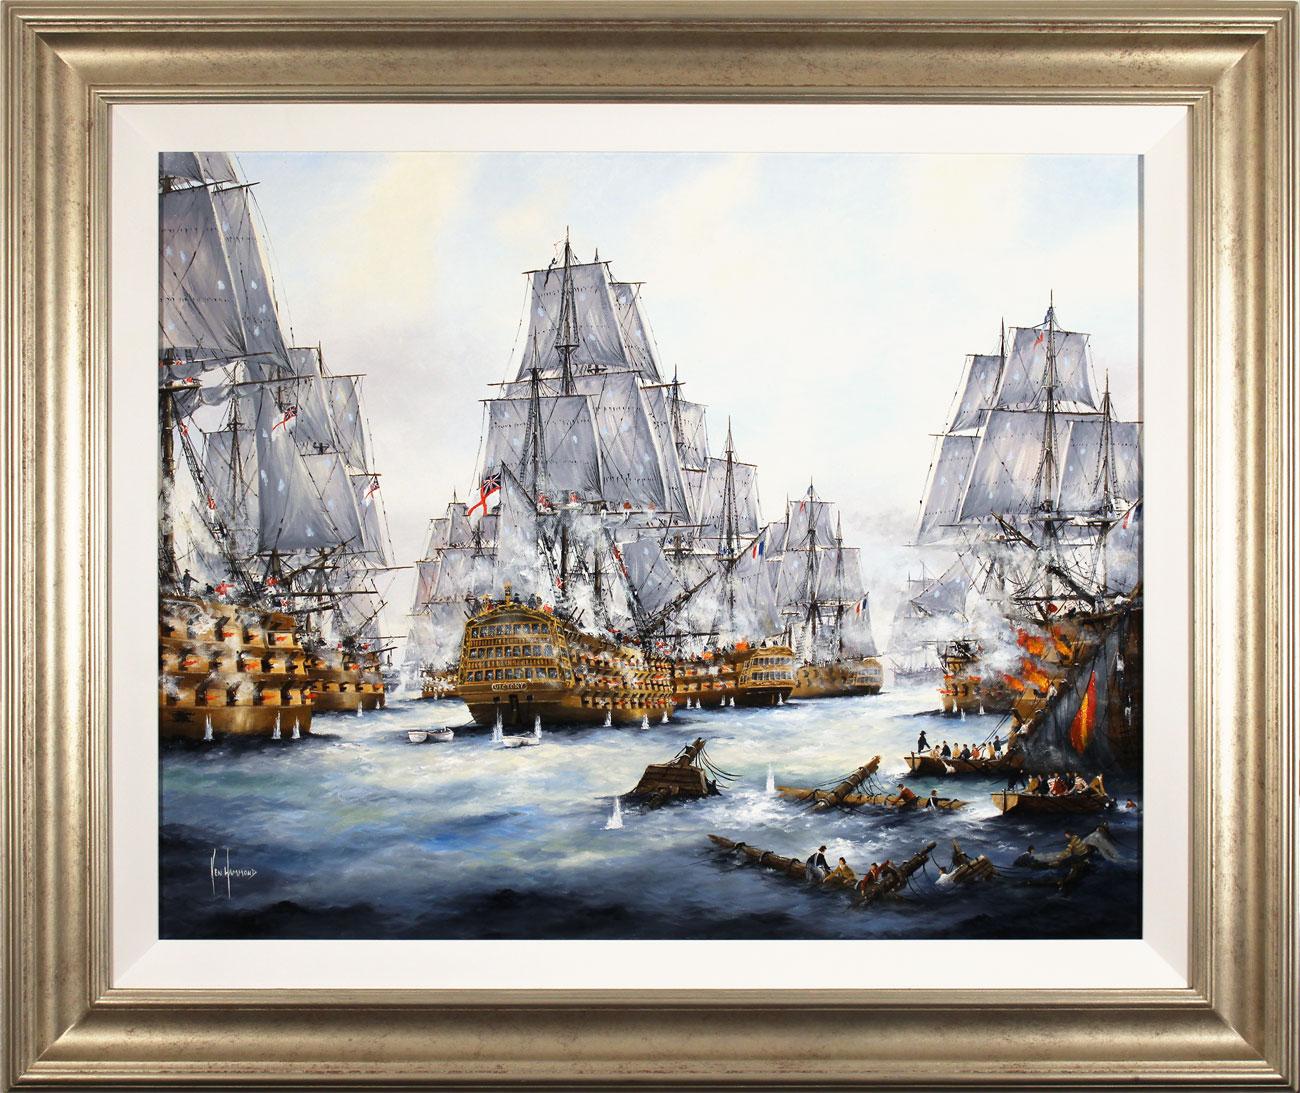 Ken Hammond, Original oil painting on canvas, Battle of Trafalgar, 1805. Click to enlarge